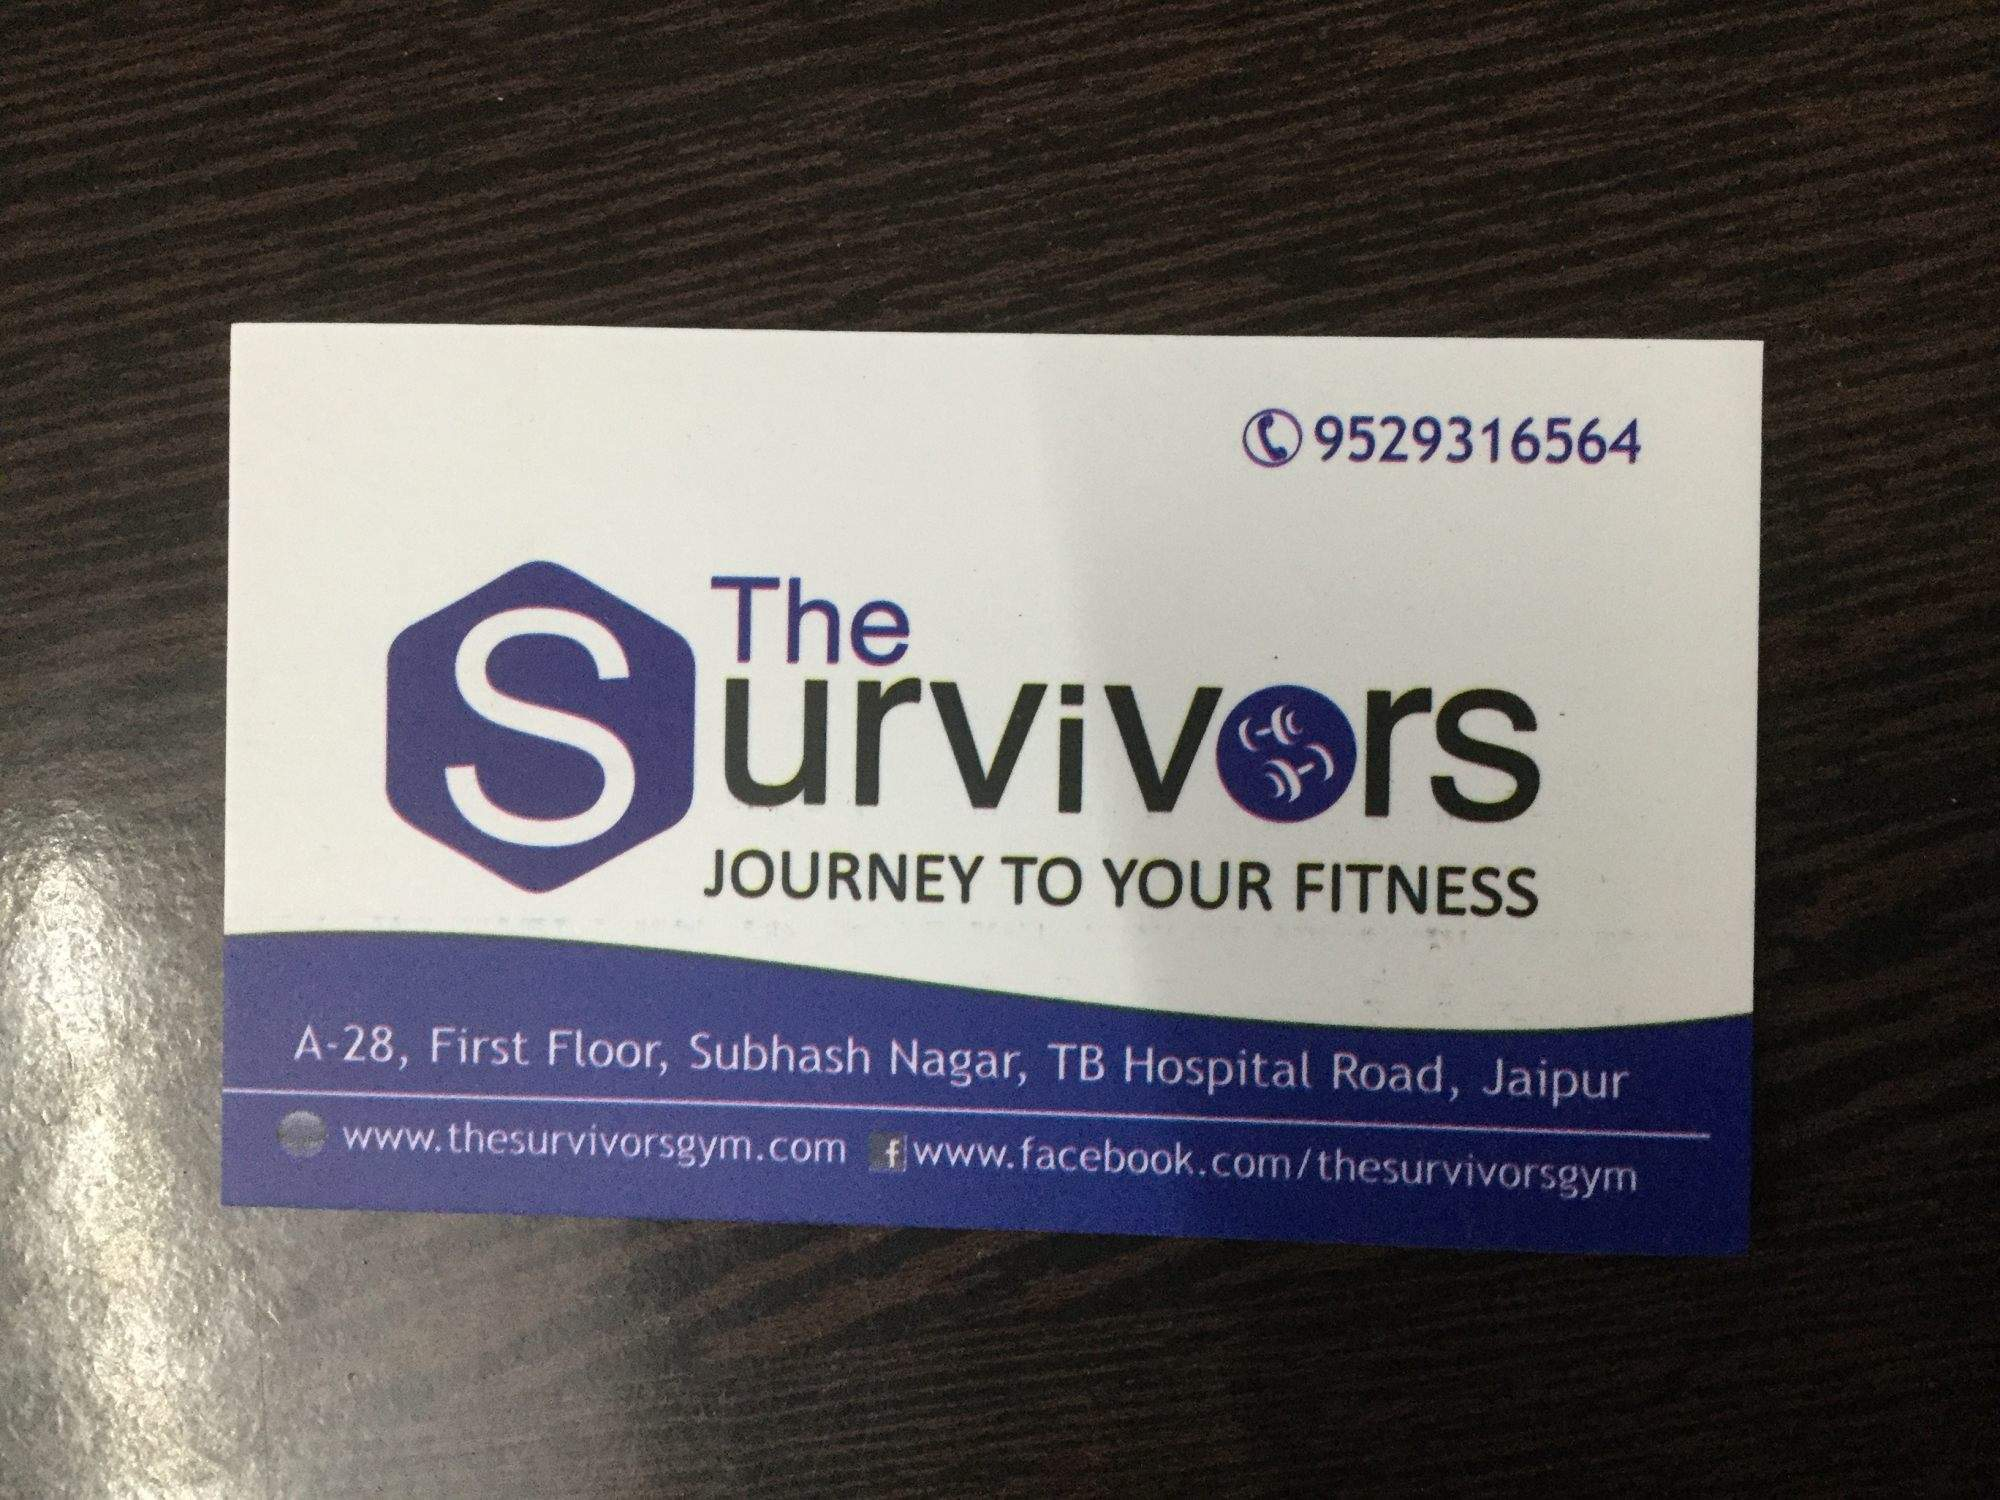 The Survivors, Subhash Nagar - Zumba Classes in Jaipur - Justdial